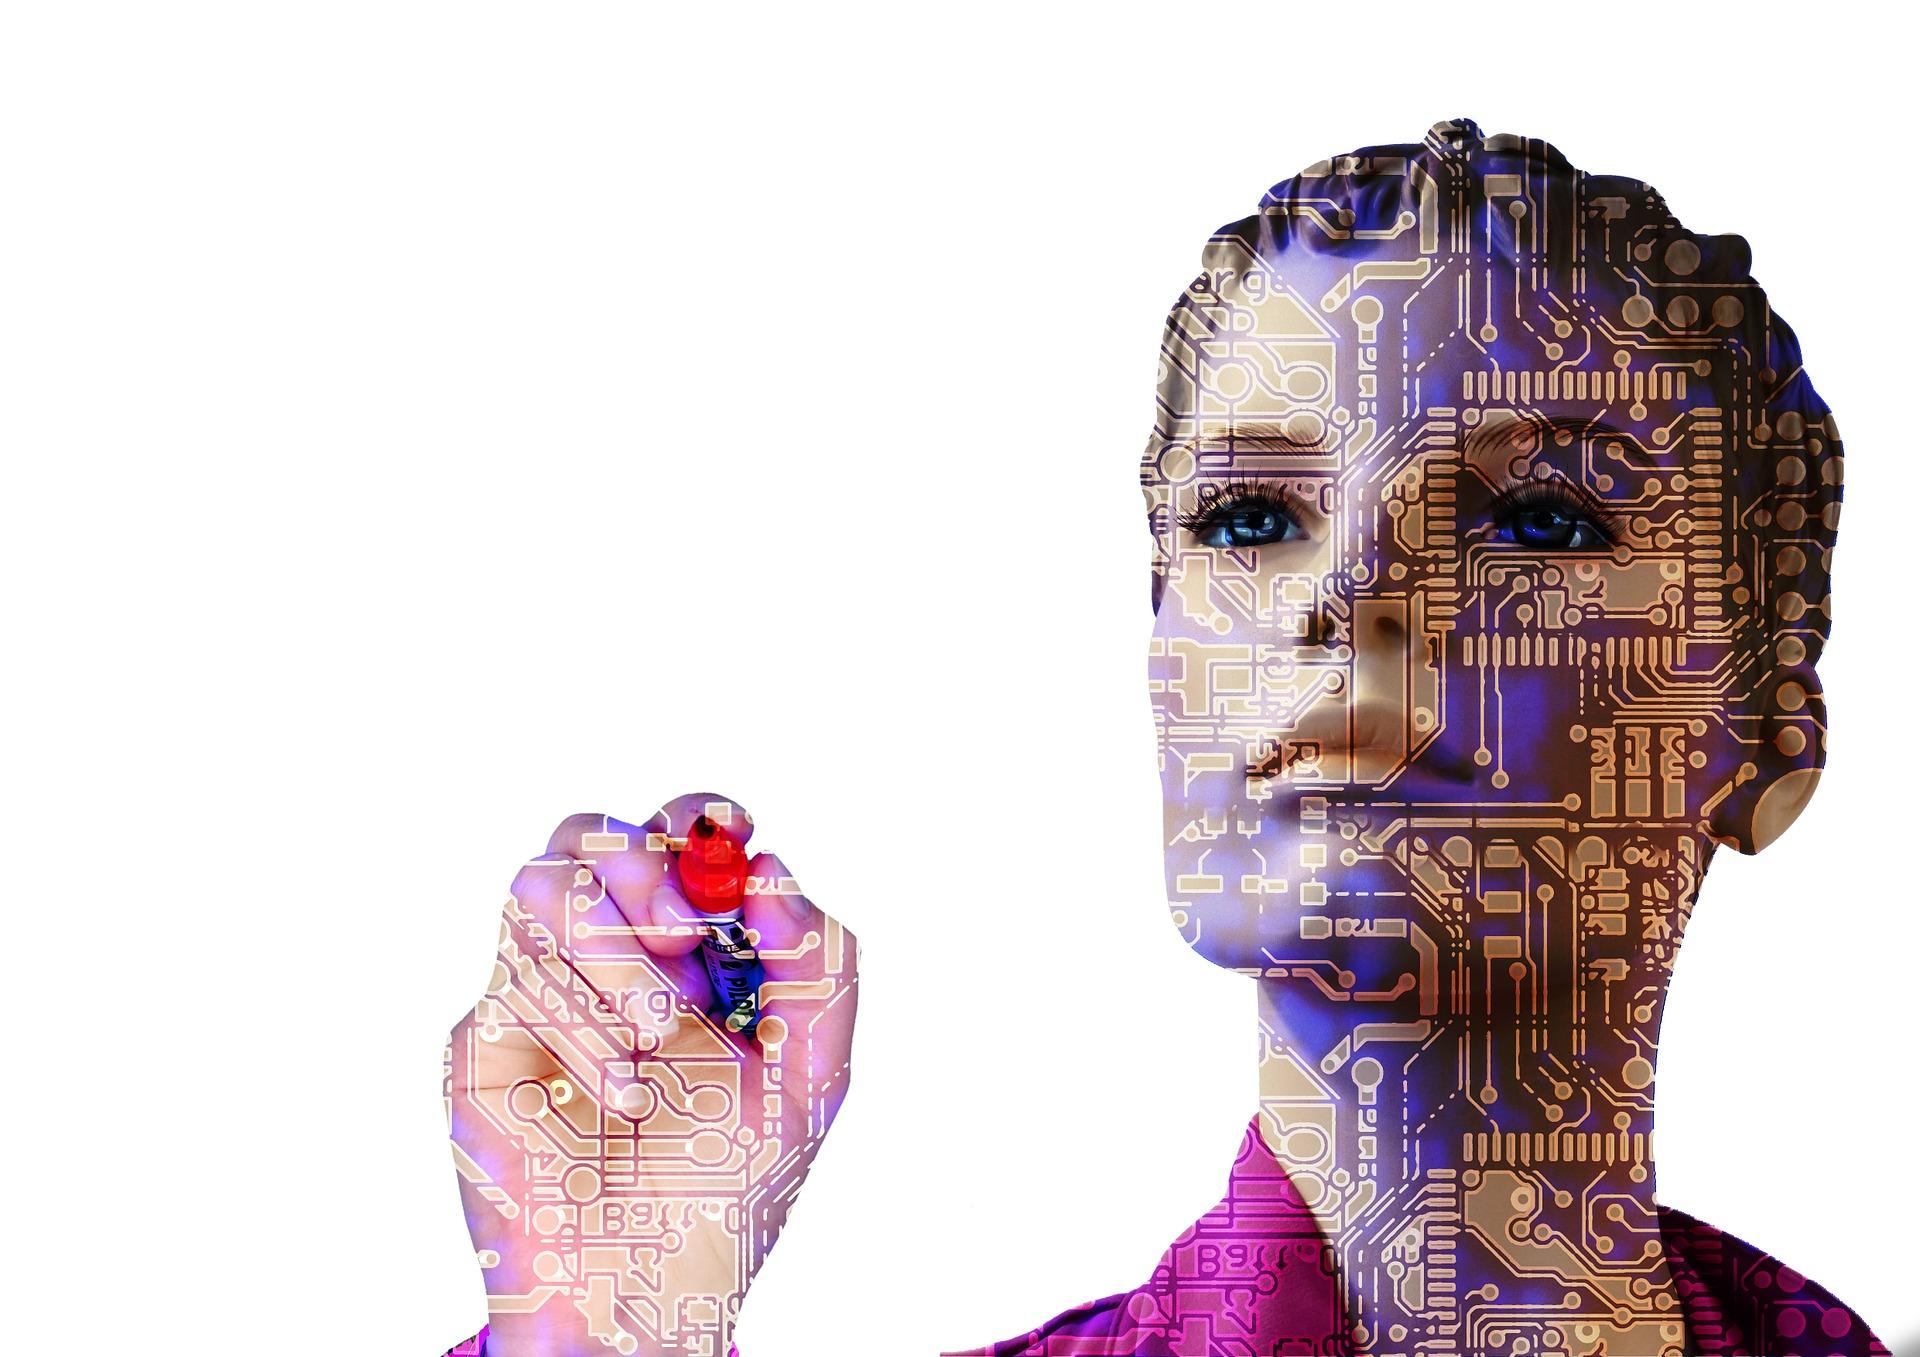 Government launches £68 million AI and robotics fund